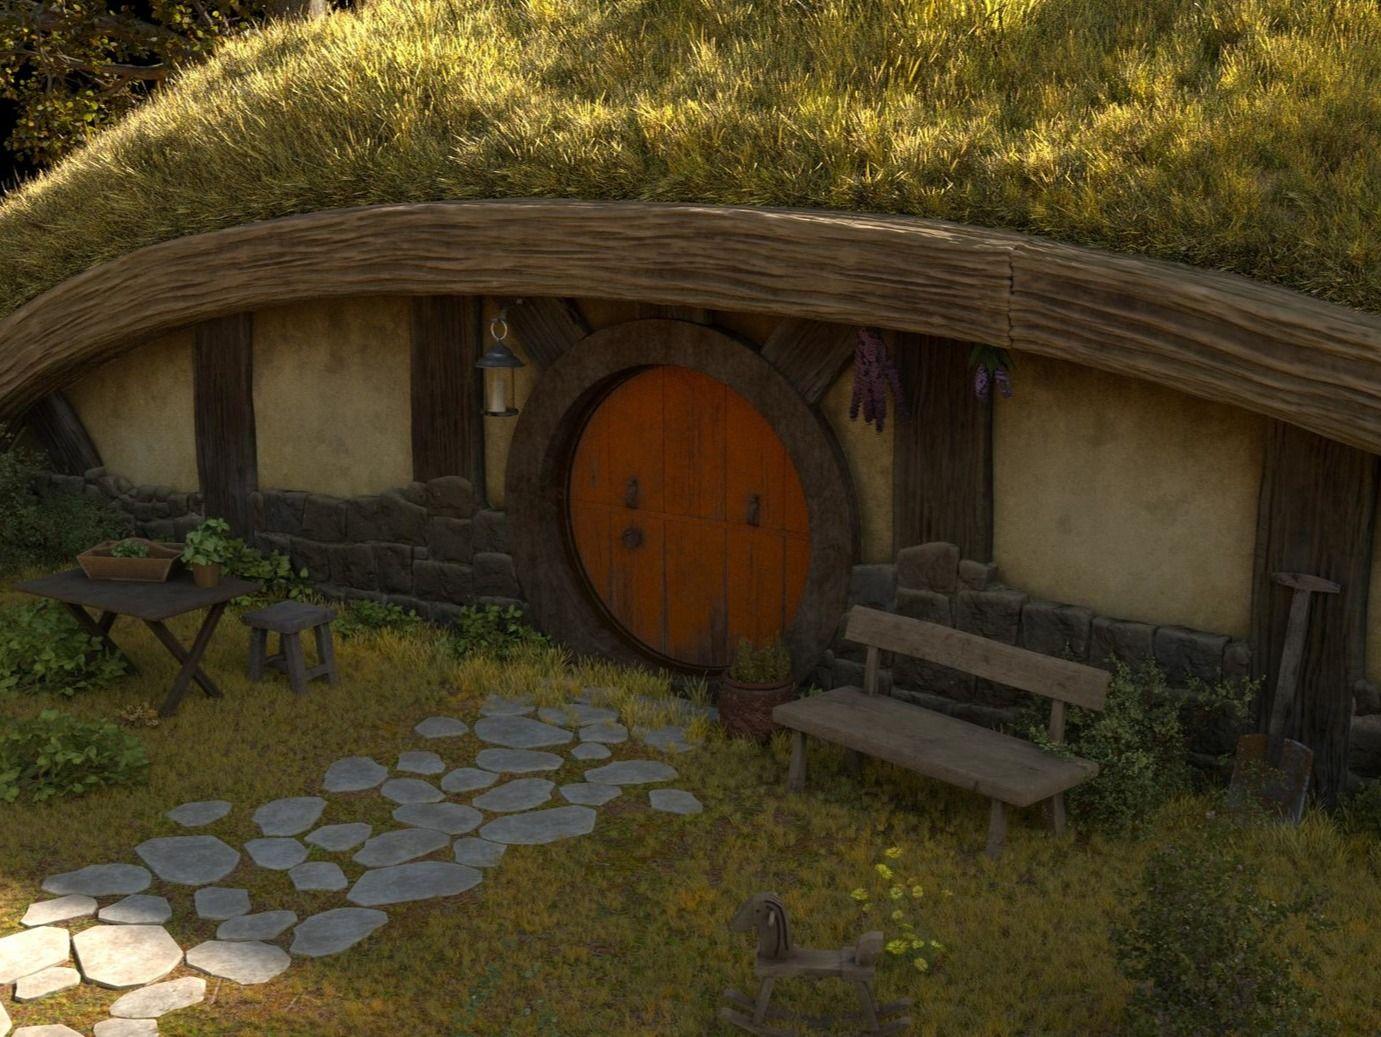 Hobbit House - VFX shot | The Rookies